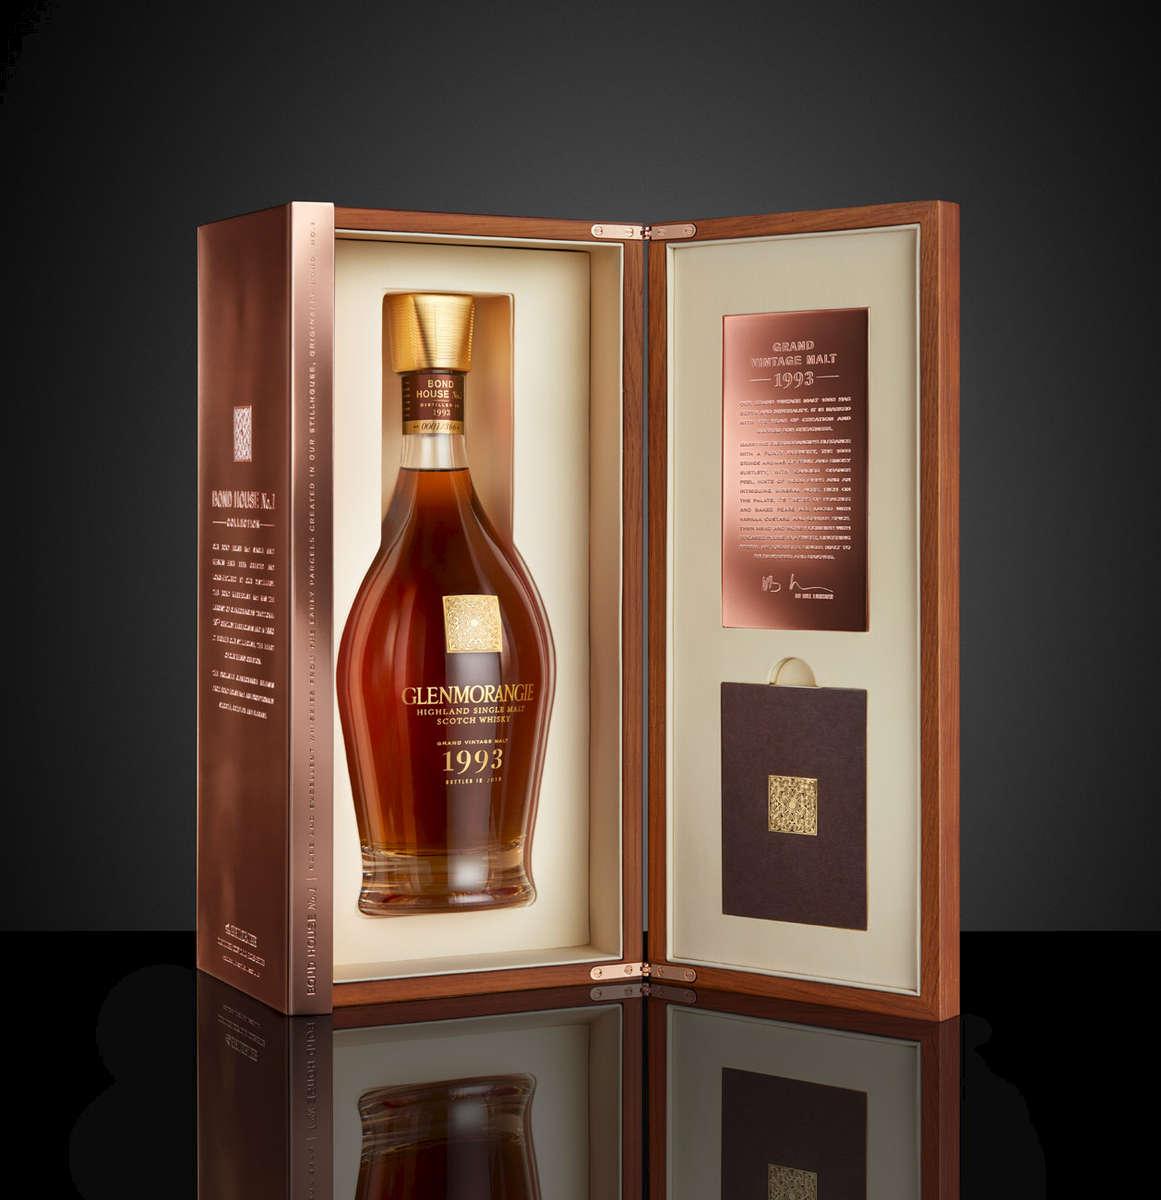 Glenmoangie 1993 whisky bottle in copper gift box